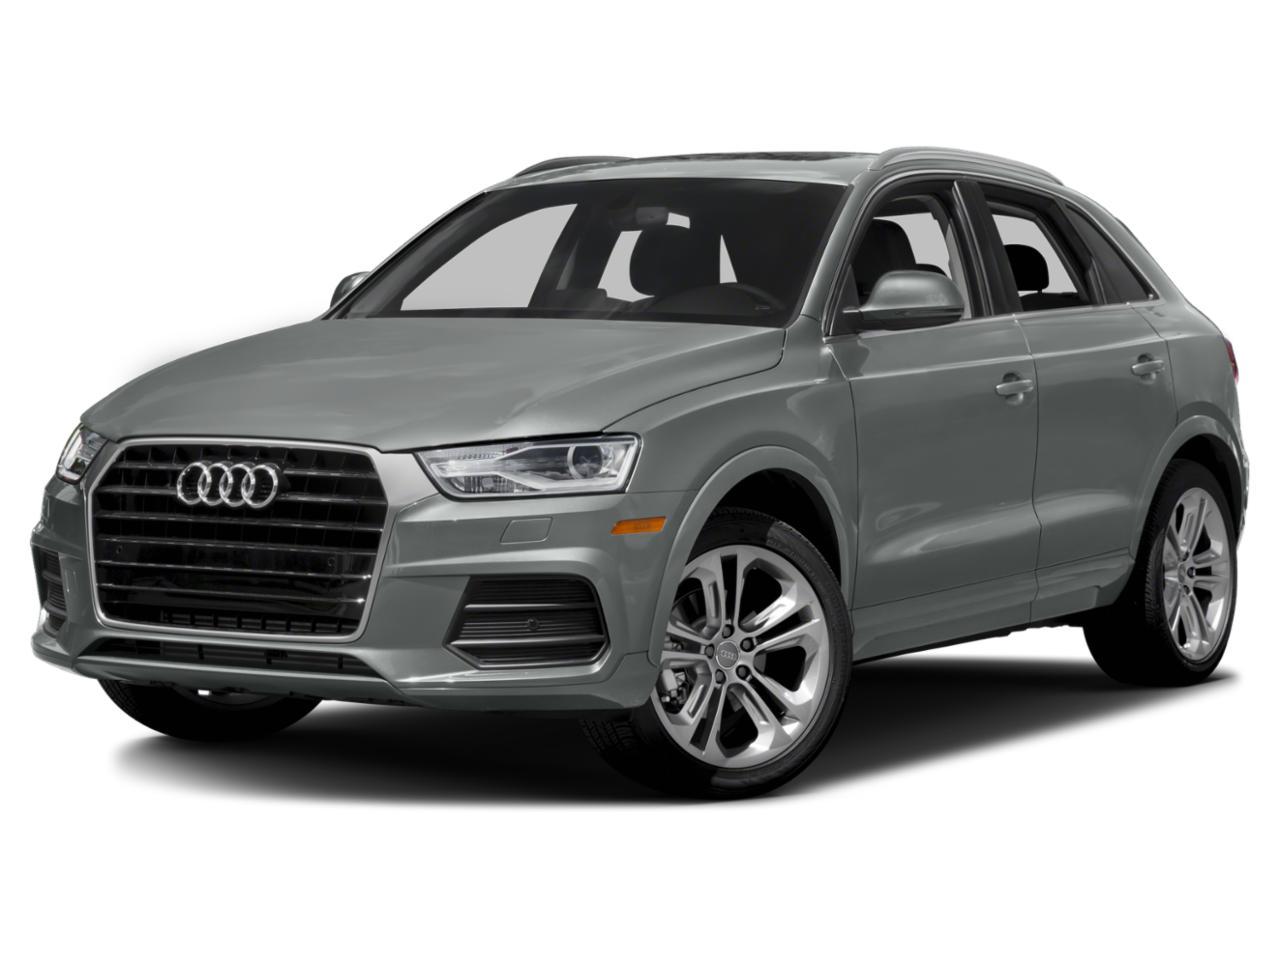 2018 Audi Q3 Vehicle Photo in Plainfield, IL 60586